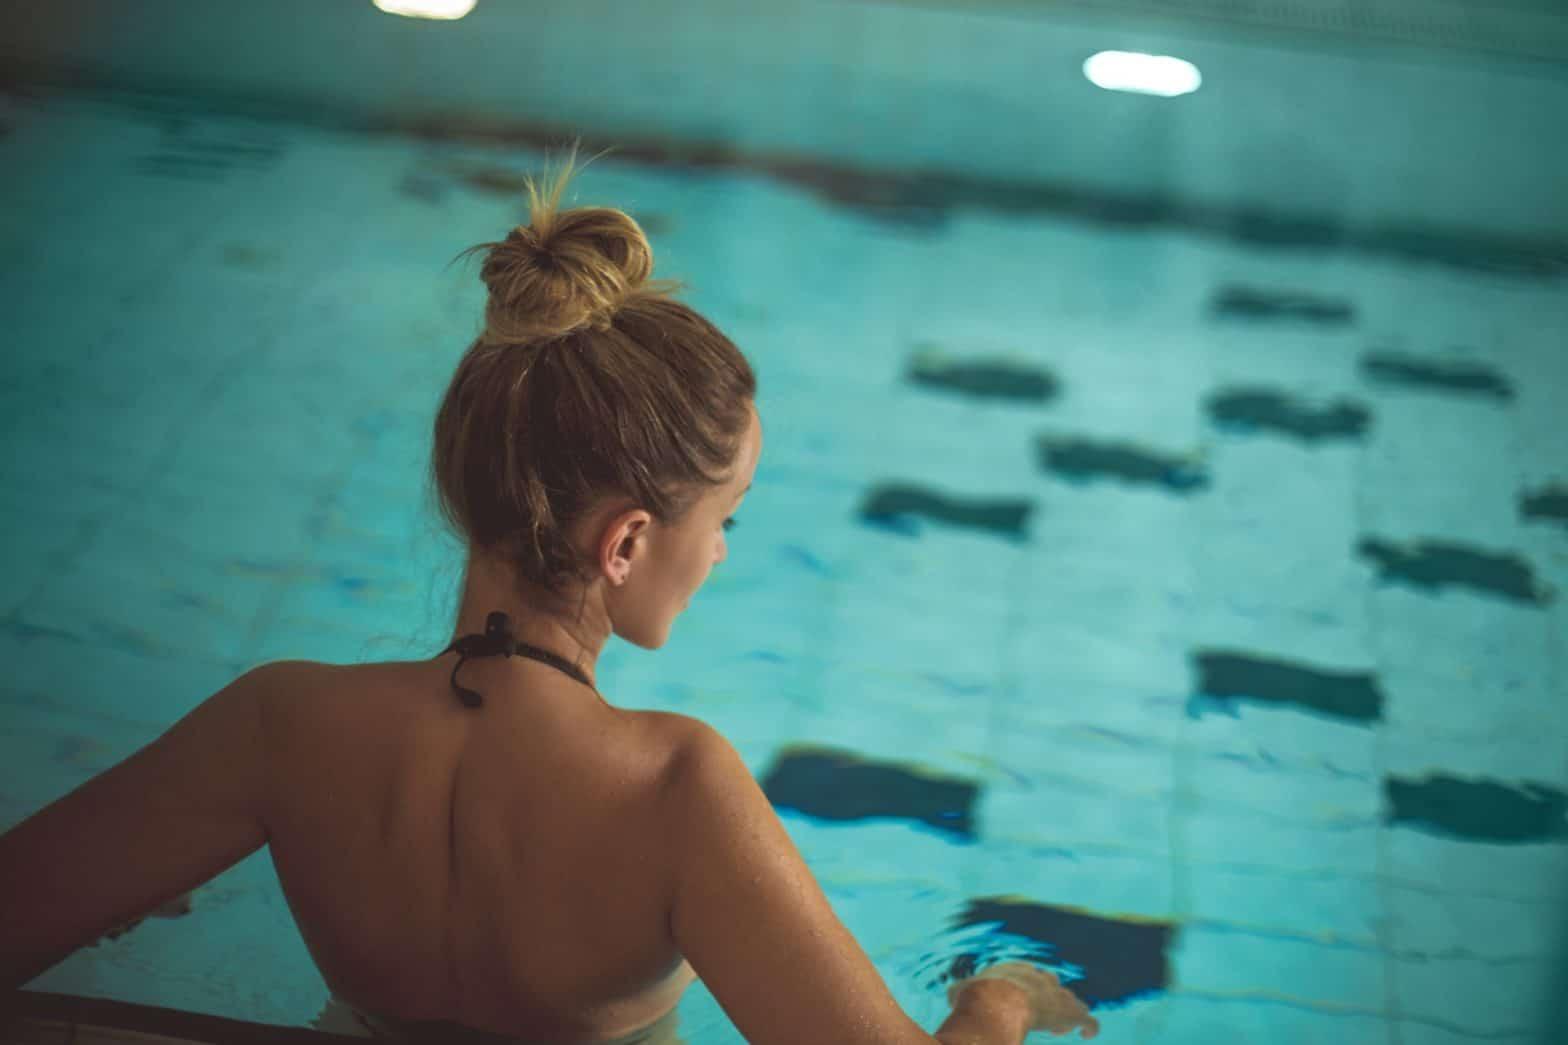 Junge Frau um Schwimmbad